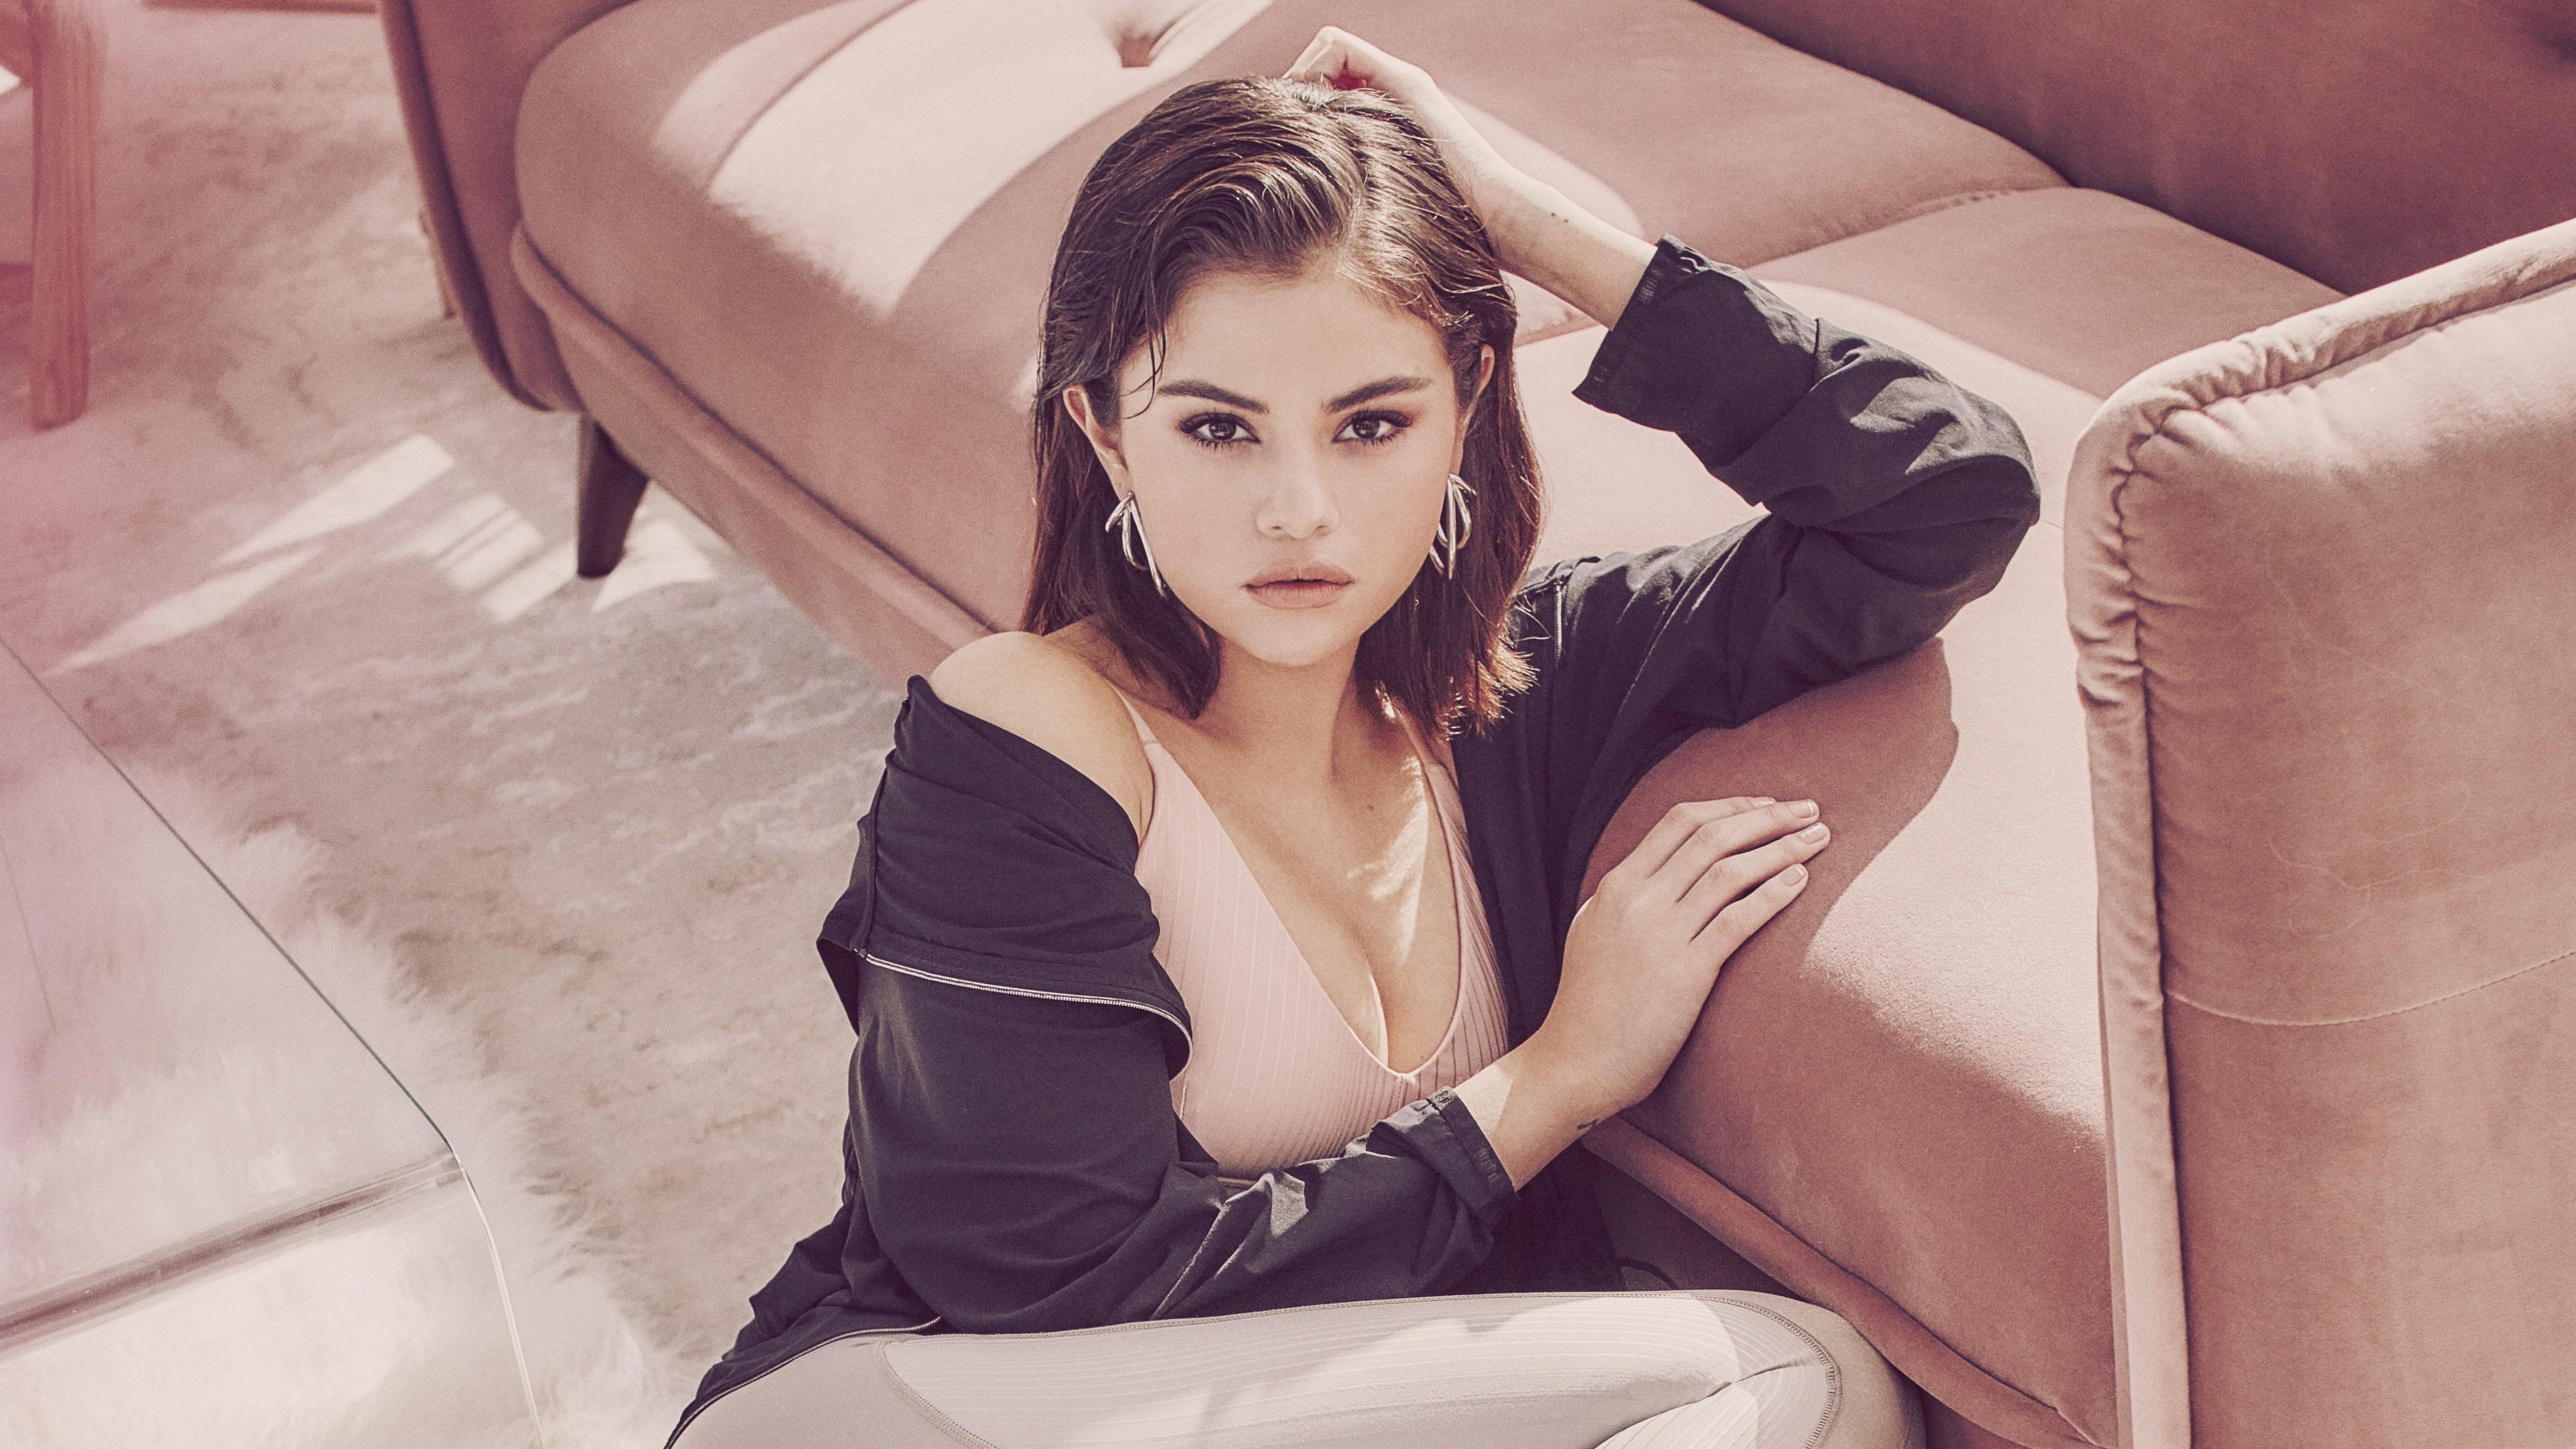 selena gomez puma campaign 2019 photoshoot 5k 1536862983 - Selena Gomez Puma Campaign 2019 Photoshoot 5k - selena gomez wallpapers, photoshoot wallpapers, music wallpapers, hd-wallpapers, girls wallpapers, celebrities wallpapers, 5k wallpapers, 4k-wallpapers